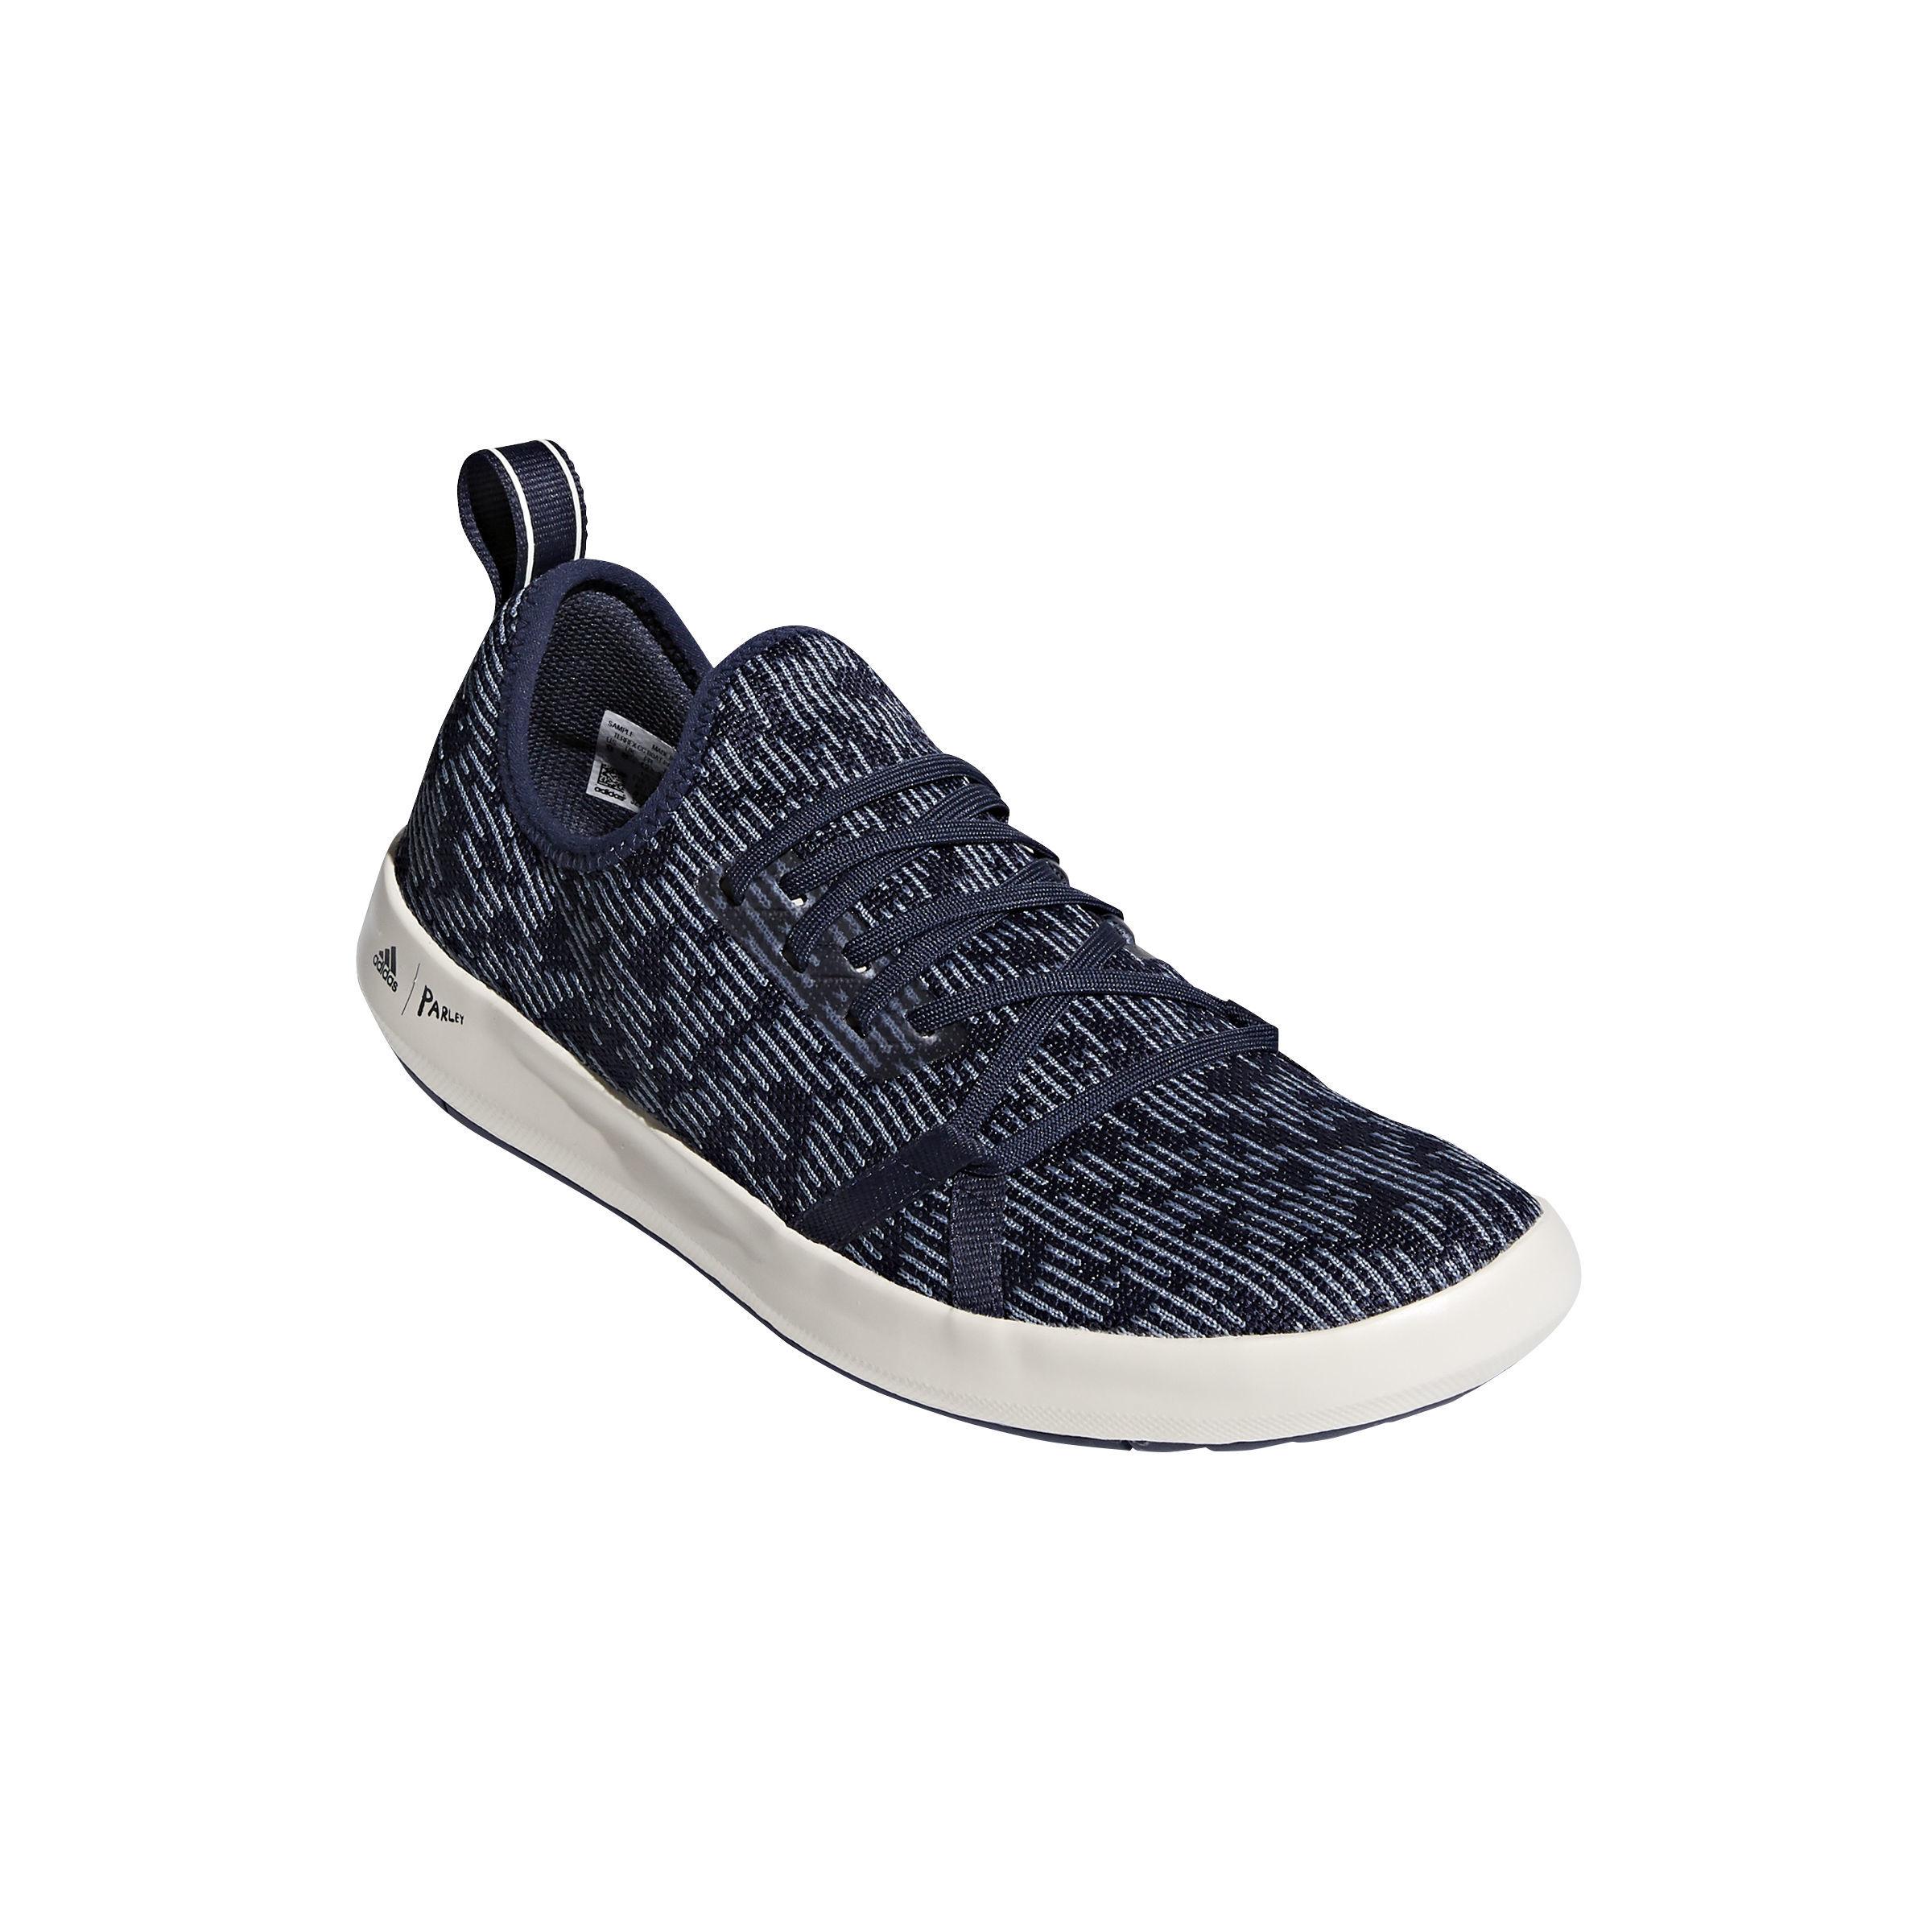 88c1e31bc64e Adidas Outdoor Terrex ClimaCool Boat Parley Shoes - Men s